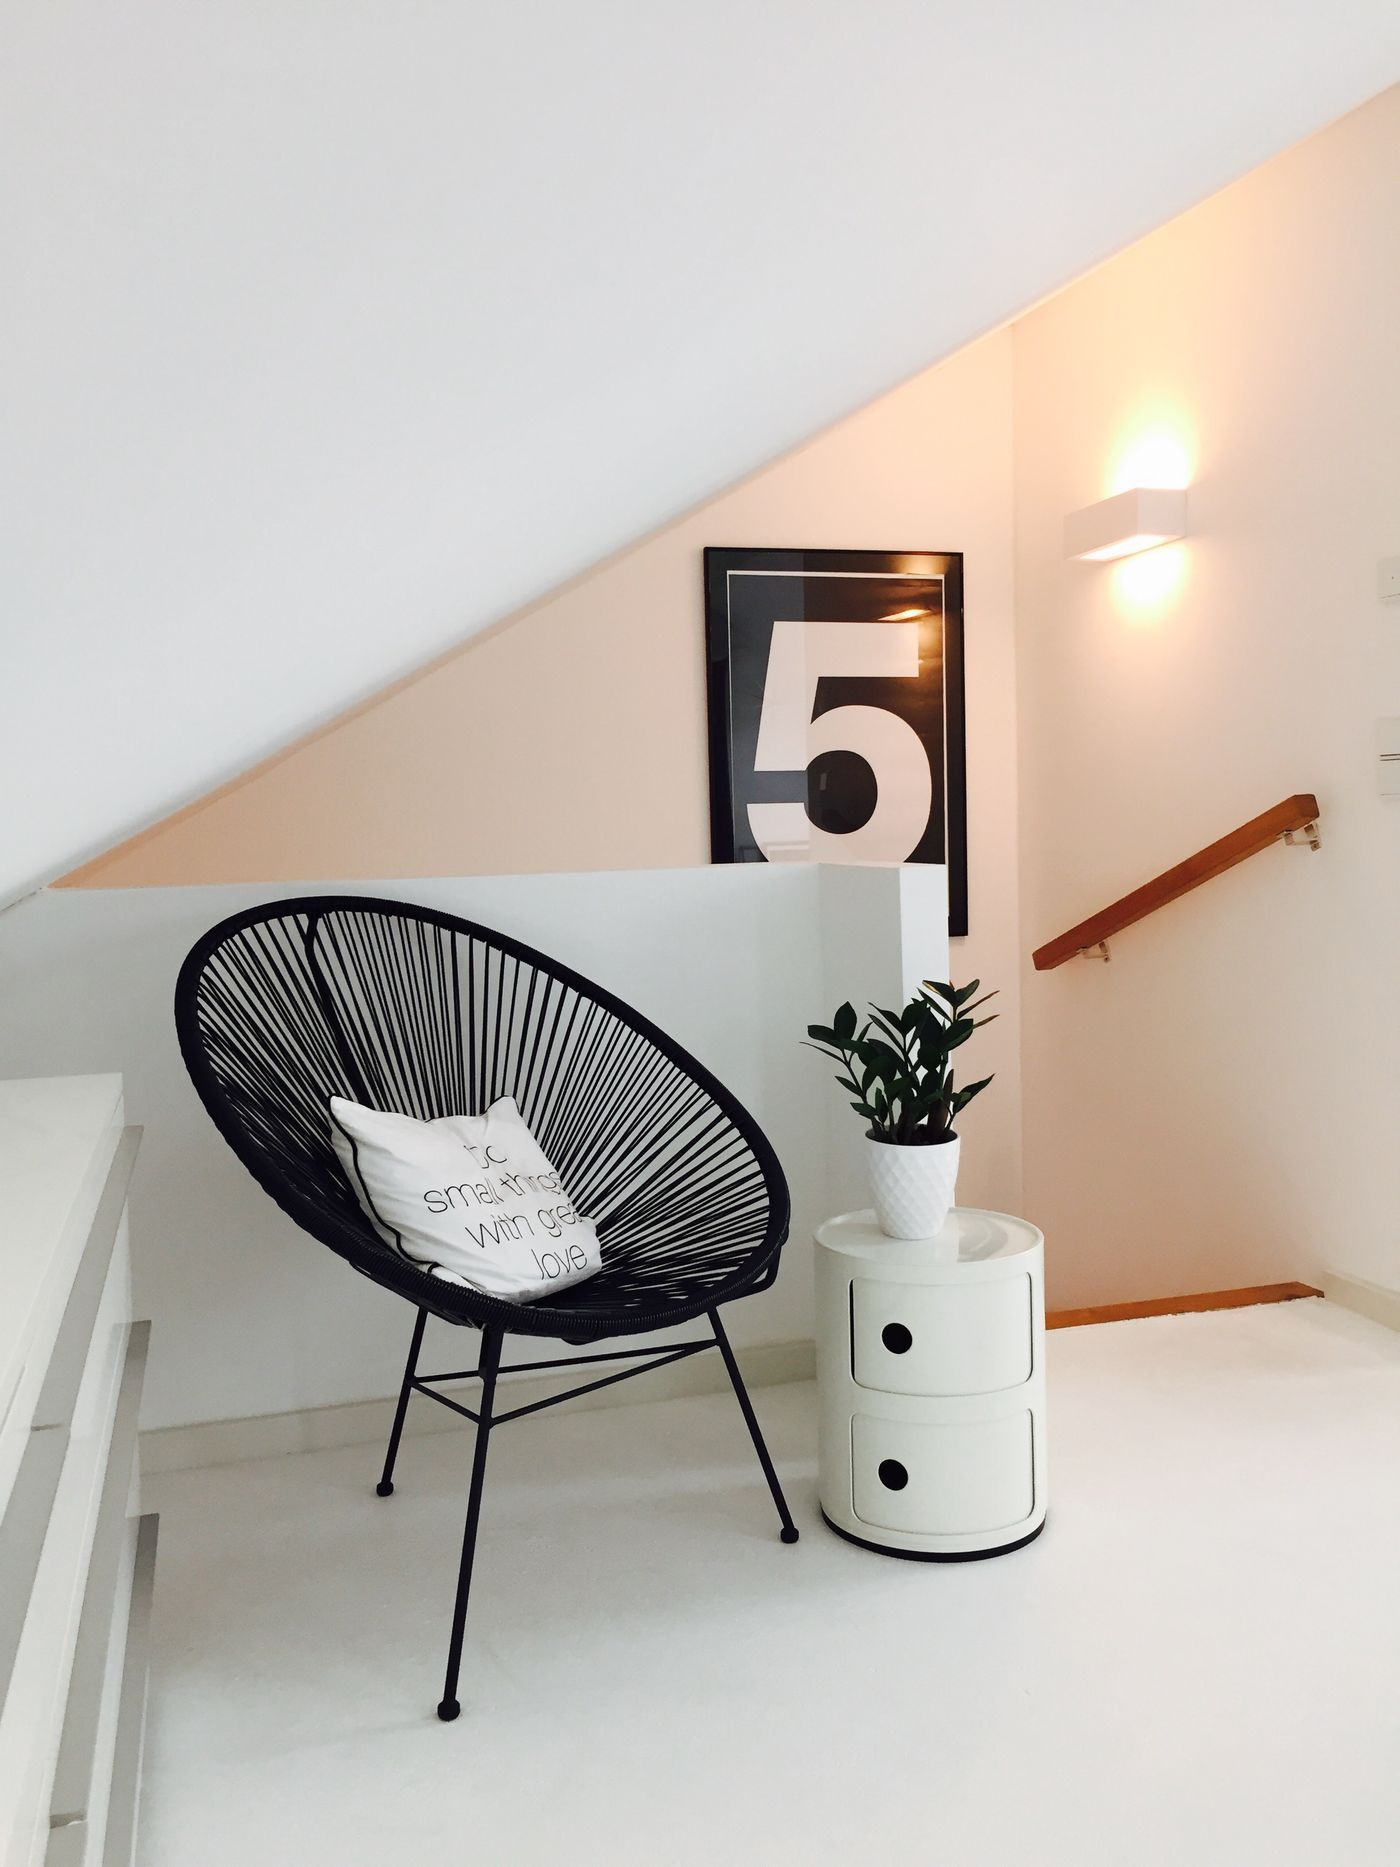 treppenaufgang gestalten die besten ideen. Black Bedroom Furniture Sets. Home Design Ideas